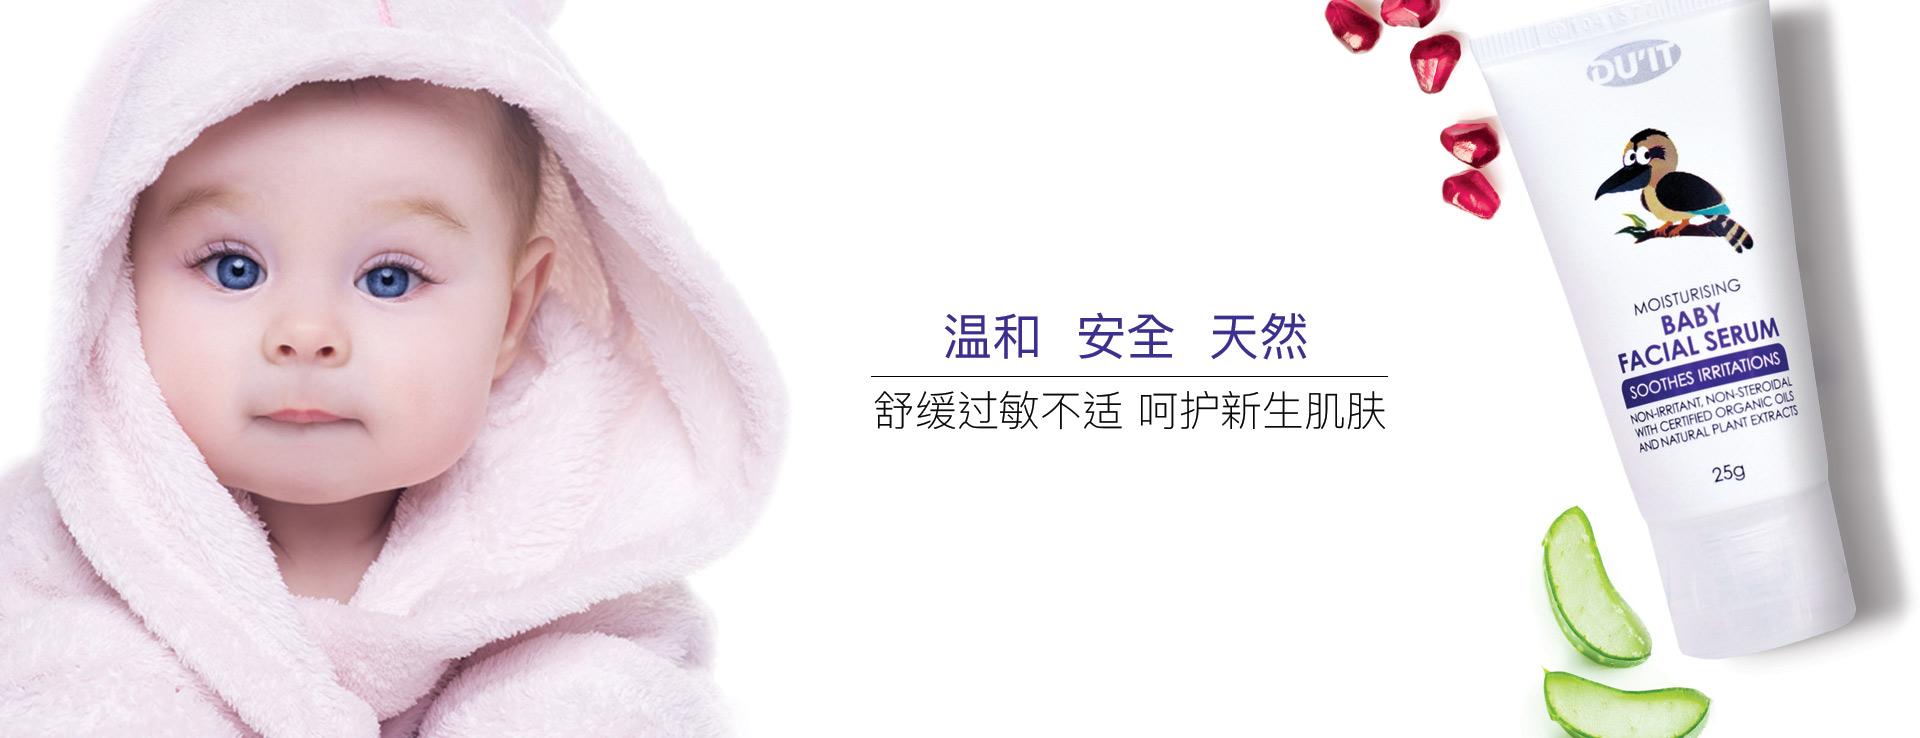 DUIT滚珠理疗足膜,世界首款滚珠式脚膜,方便使用,不油腻并容易吸收,无需再用手部涂抹